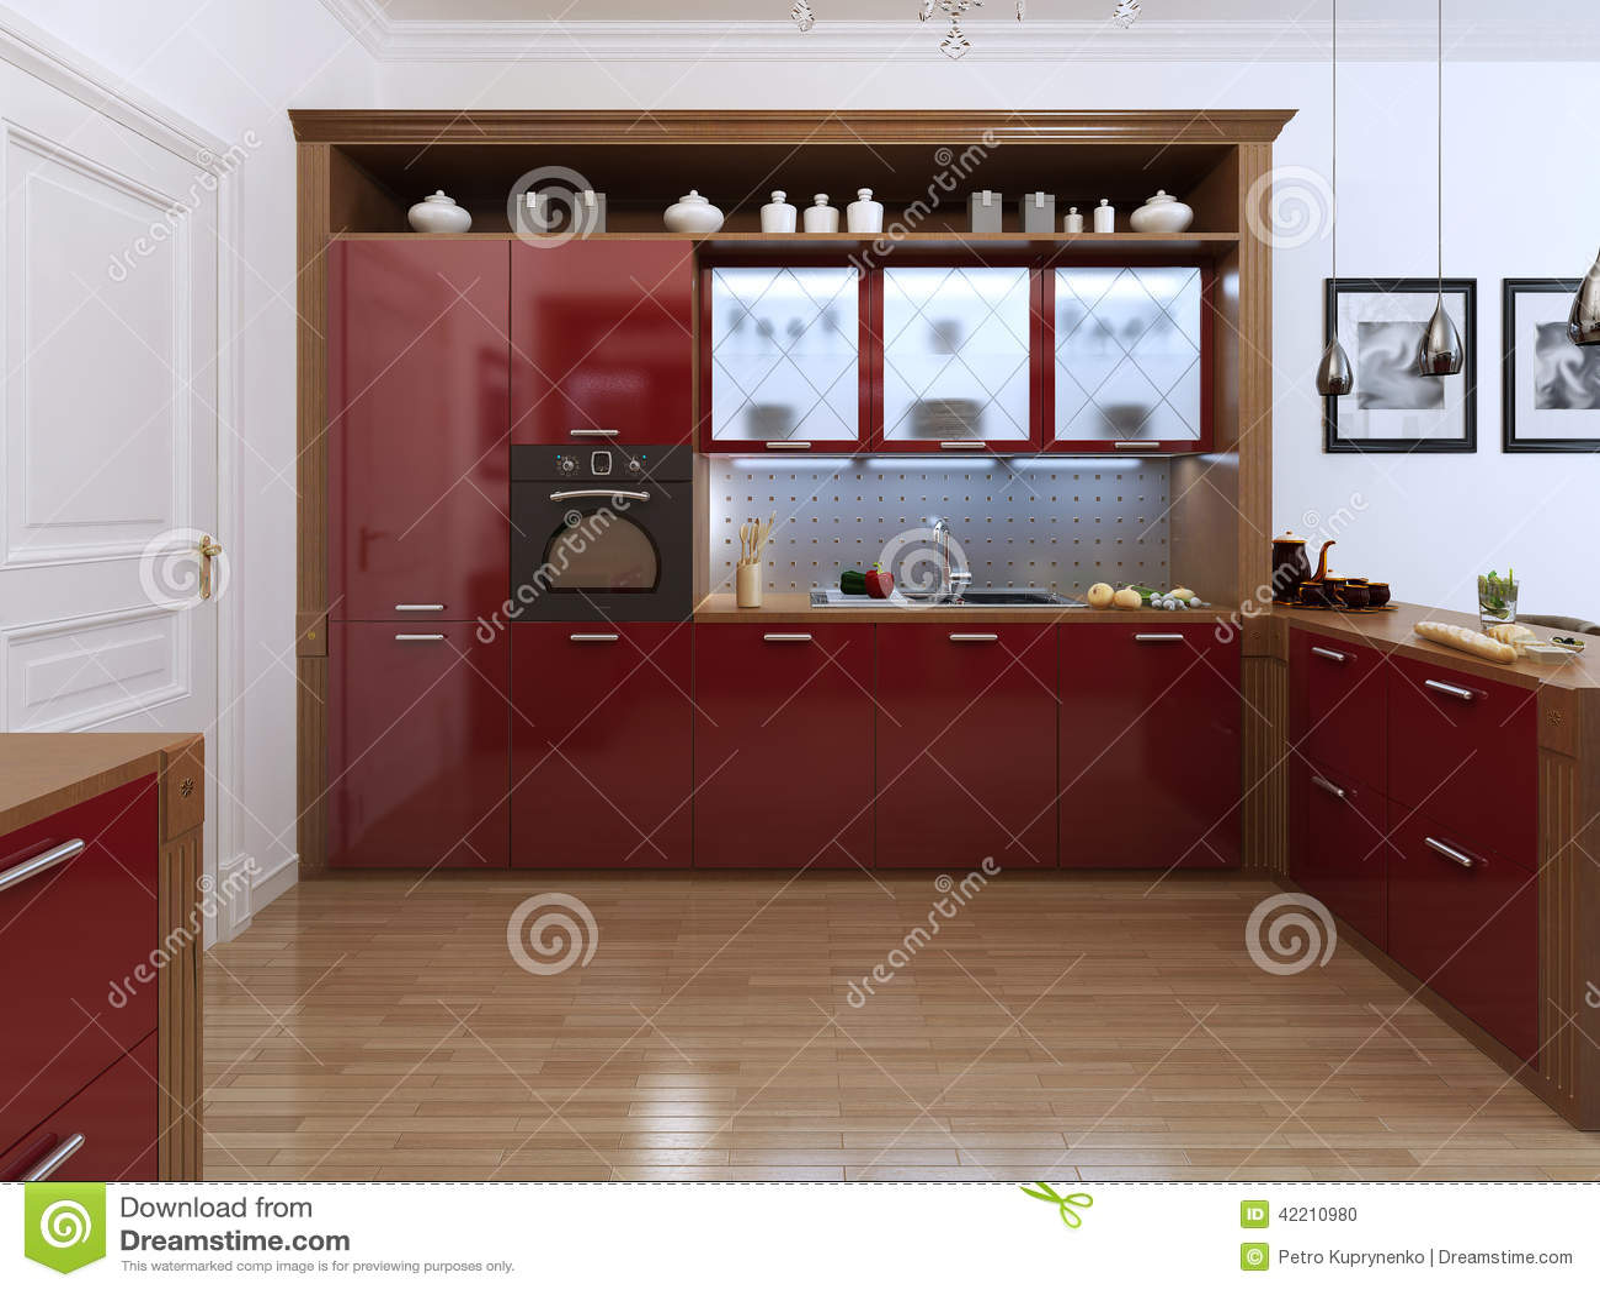 Art Deco Stijl : Kitchen in the art deco style stock illustration illustration of